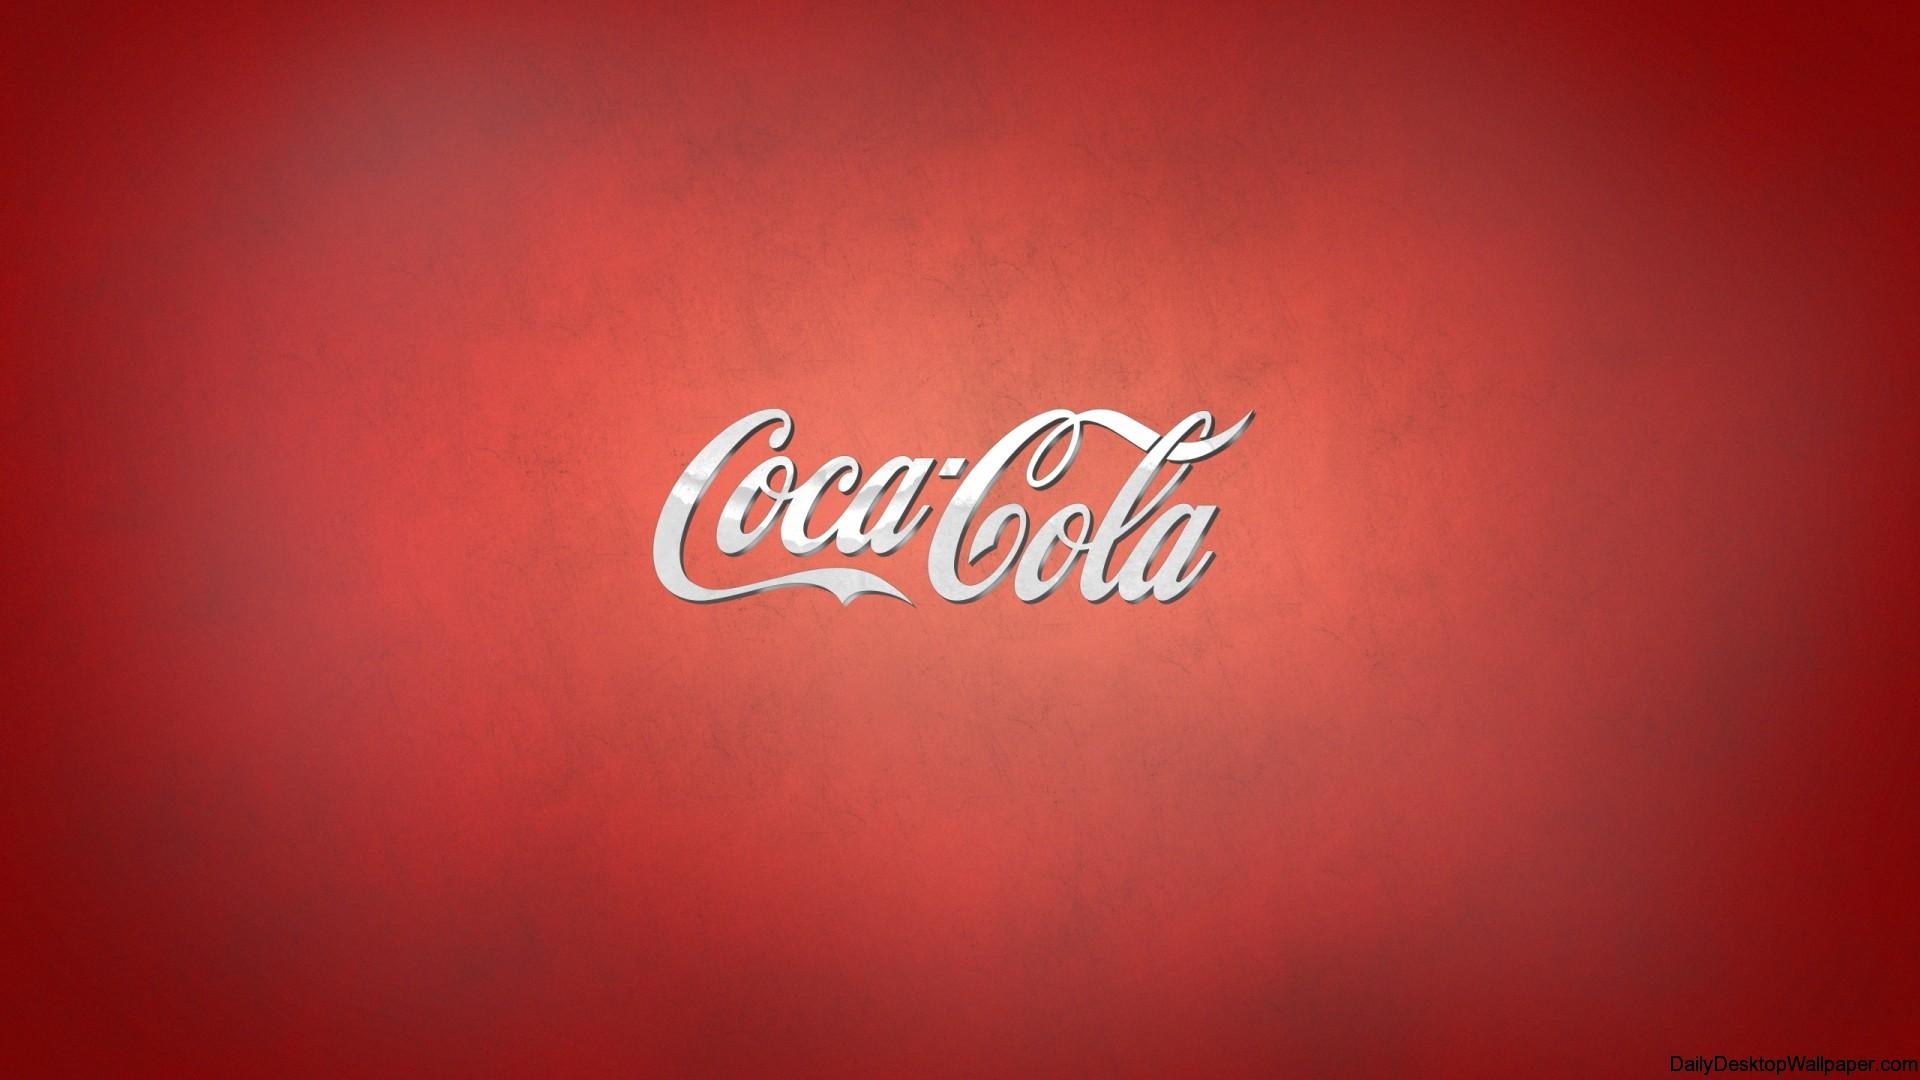 Atlanta Braves Iphone Wallpaper Coca Cola Logo Wallpaper Hd Wallpapers